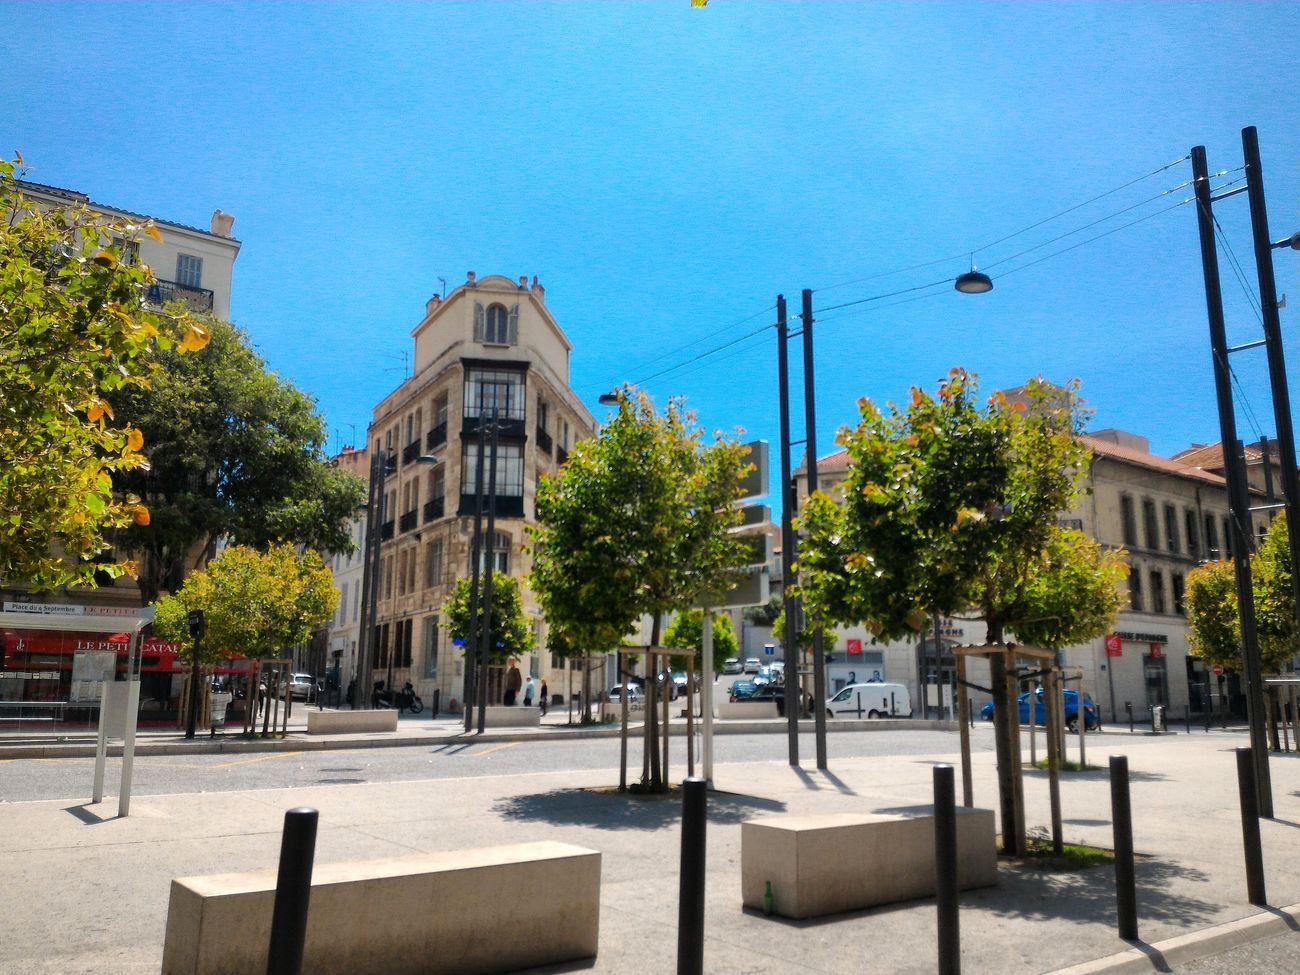 Landscape Landscapes Square Squareinstapic Trees Sky View Street Architecture Design Thearchitect-2016-eyeemawards TheArchitect2016EyeemAwards Marseille Provence France